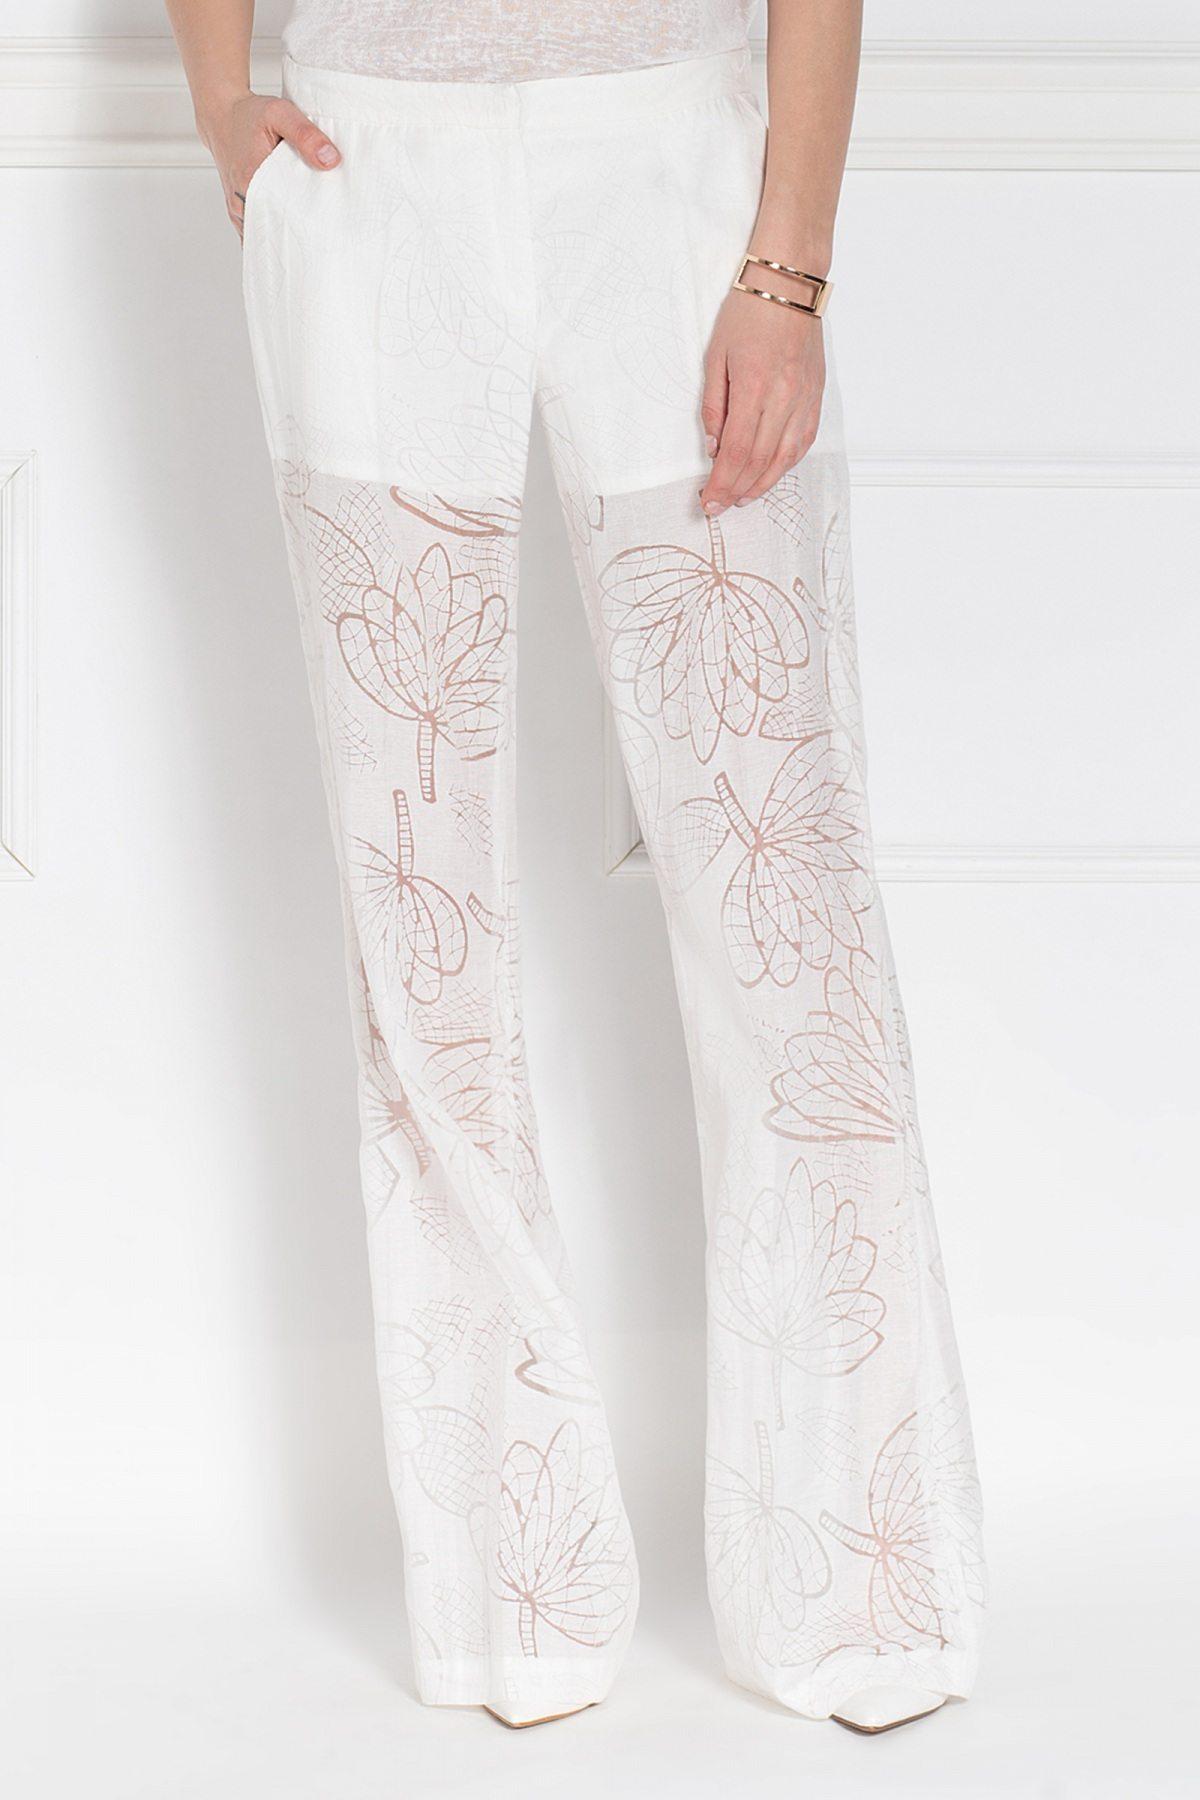 Pantalon din tesatura transparenta cu imprimeu floral Crem